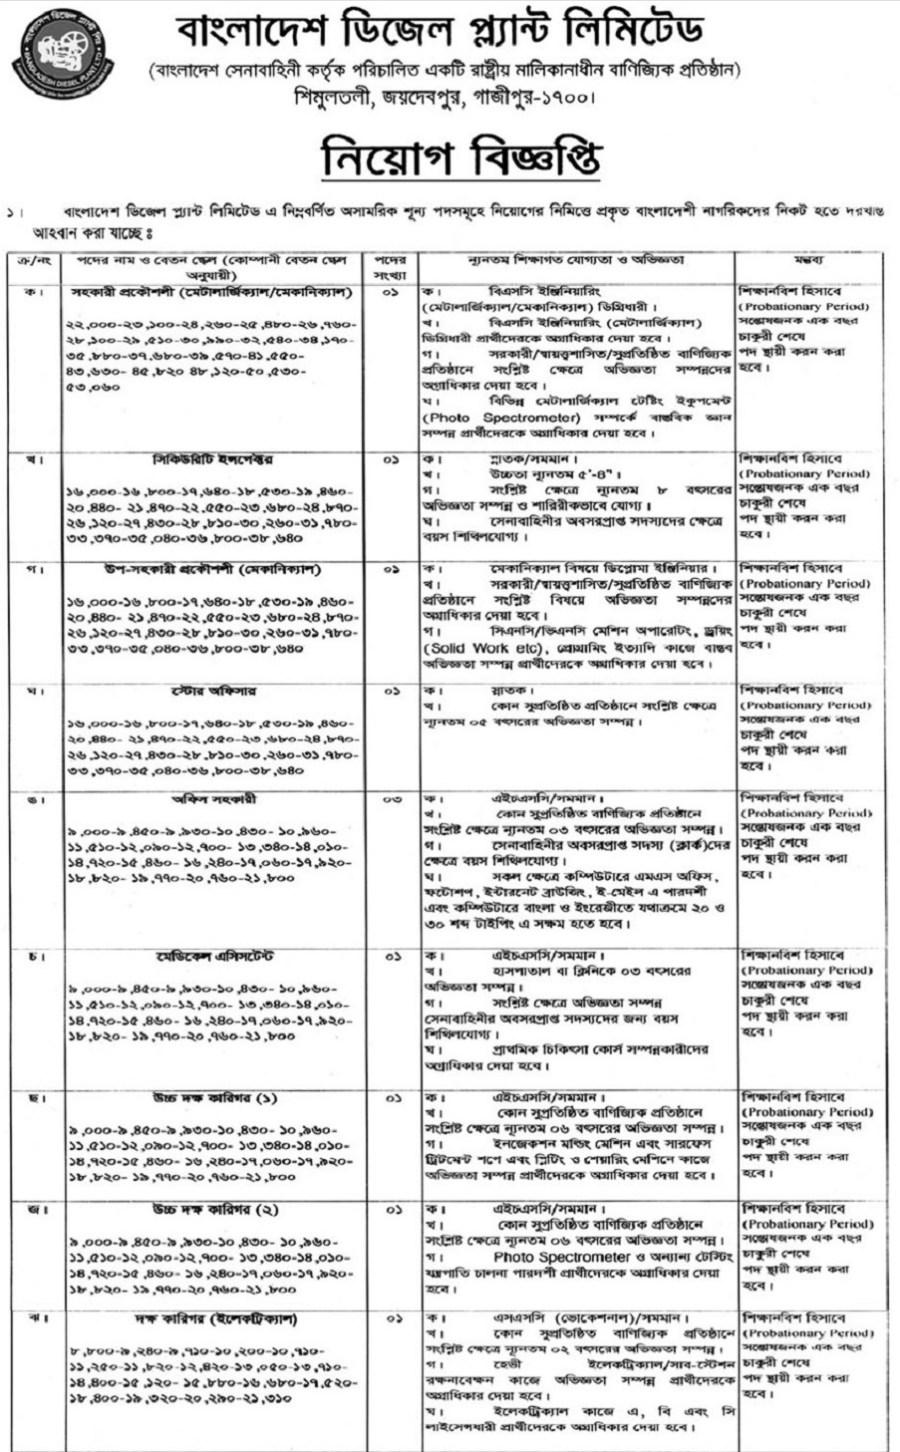 See Bangladesh Diesel Plant Limited Job Circular April 2021